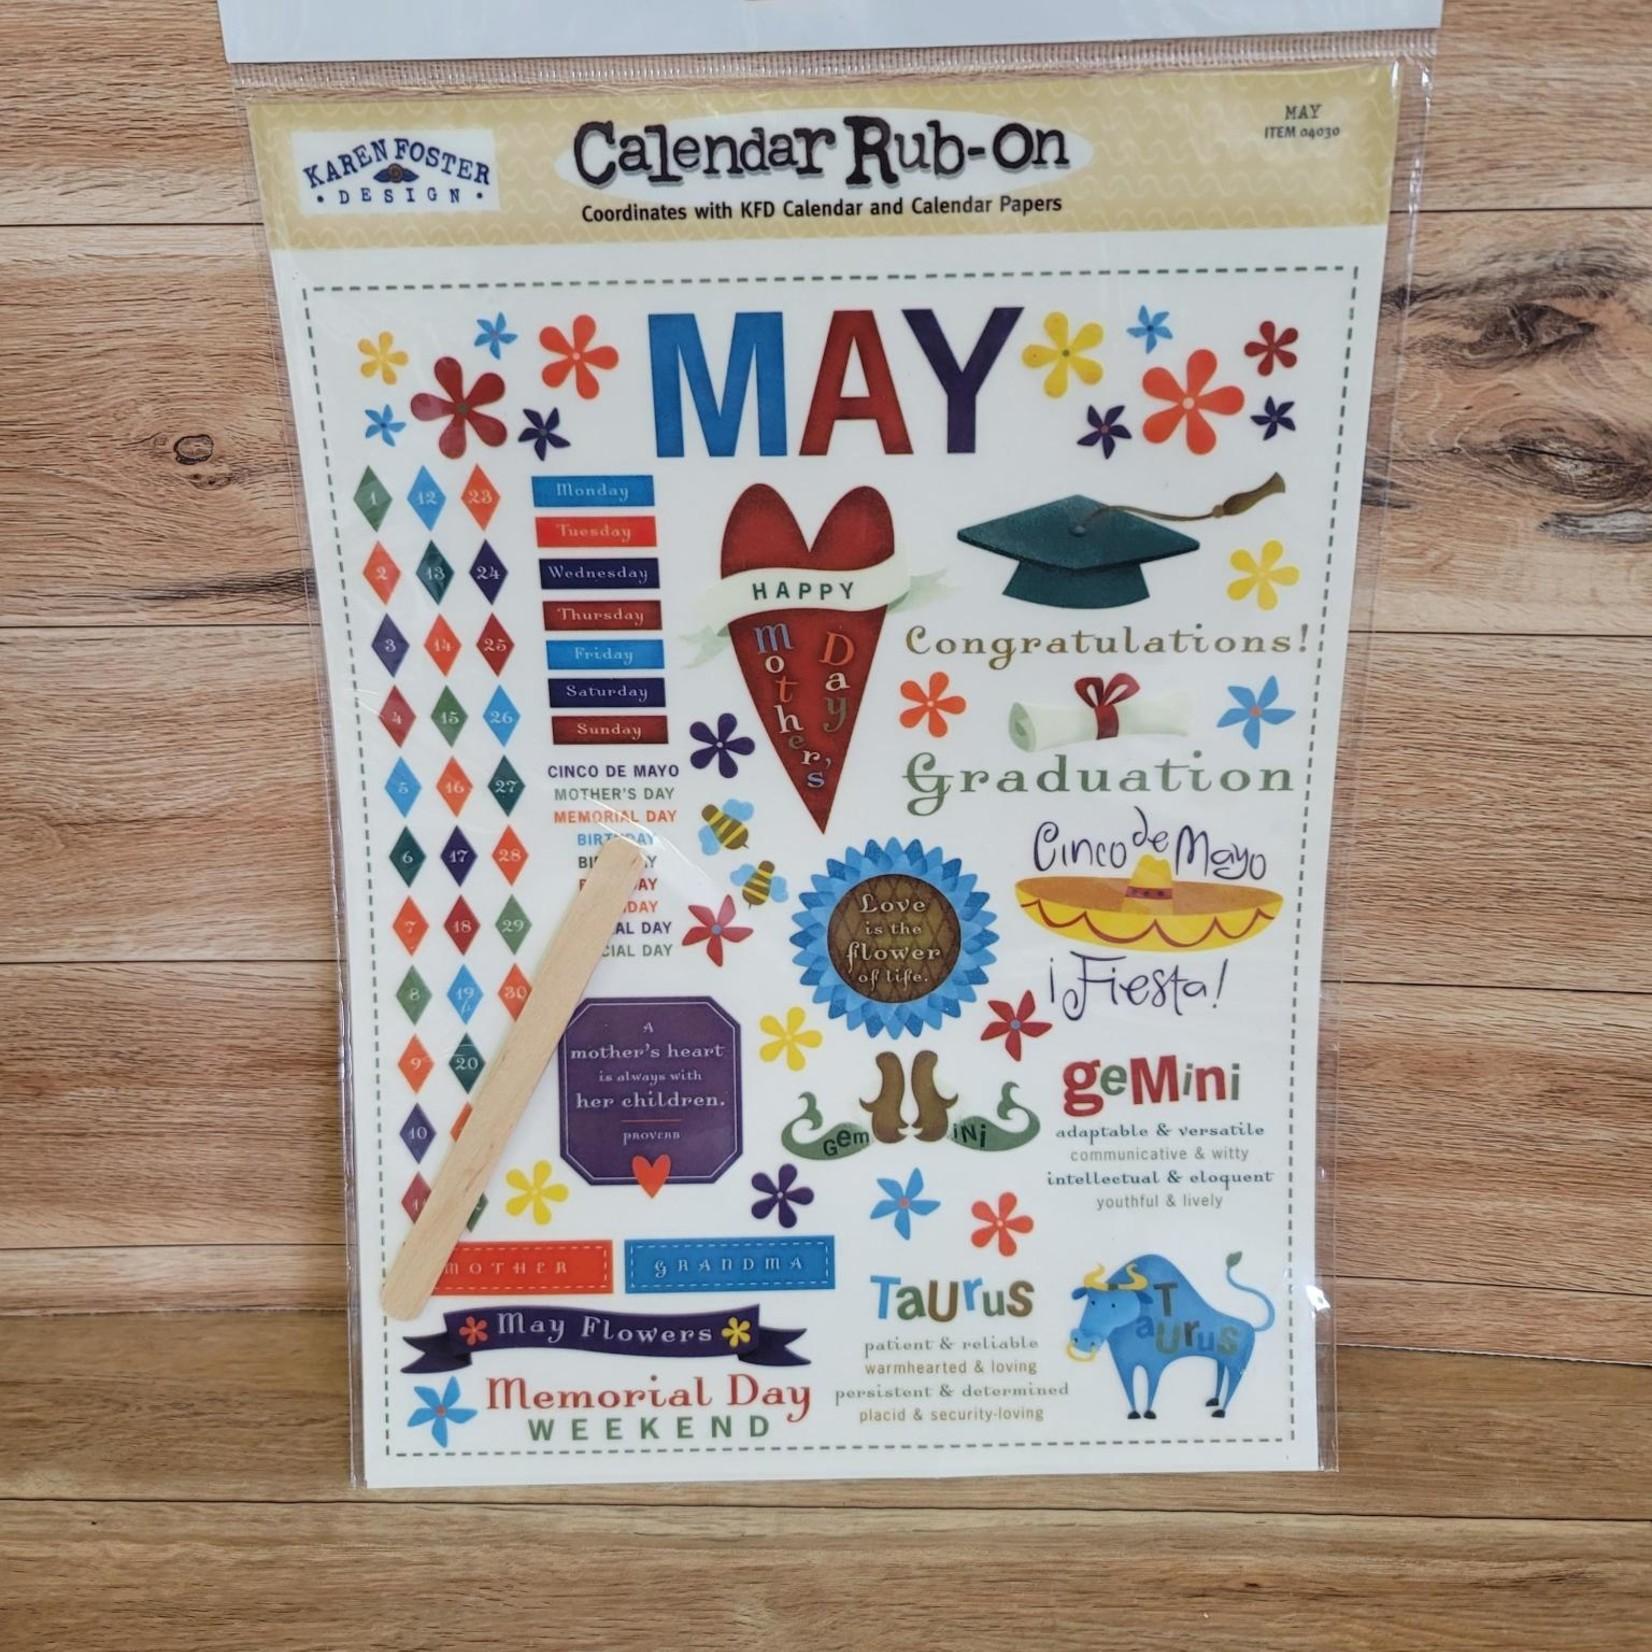 Calendar Rub-ons - May